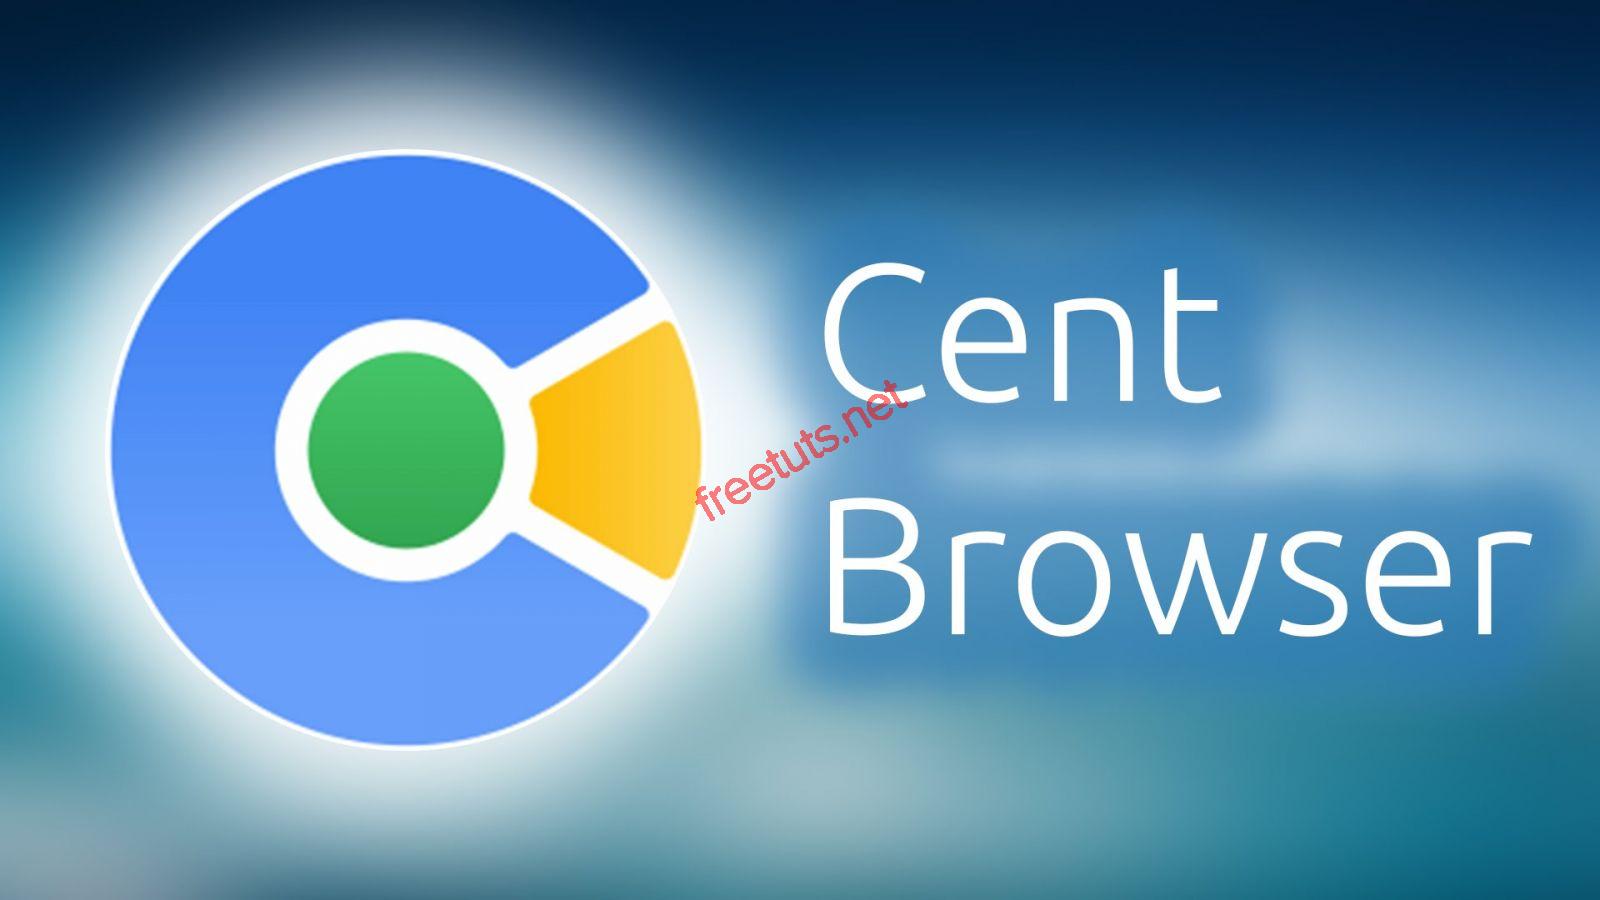 download trinh duyet cent browser 01 jpg